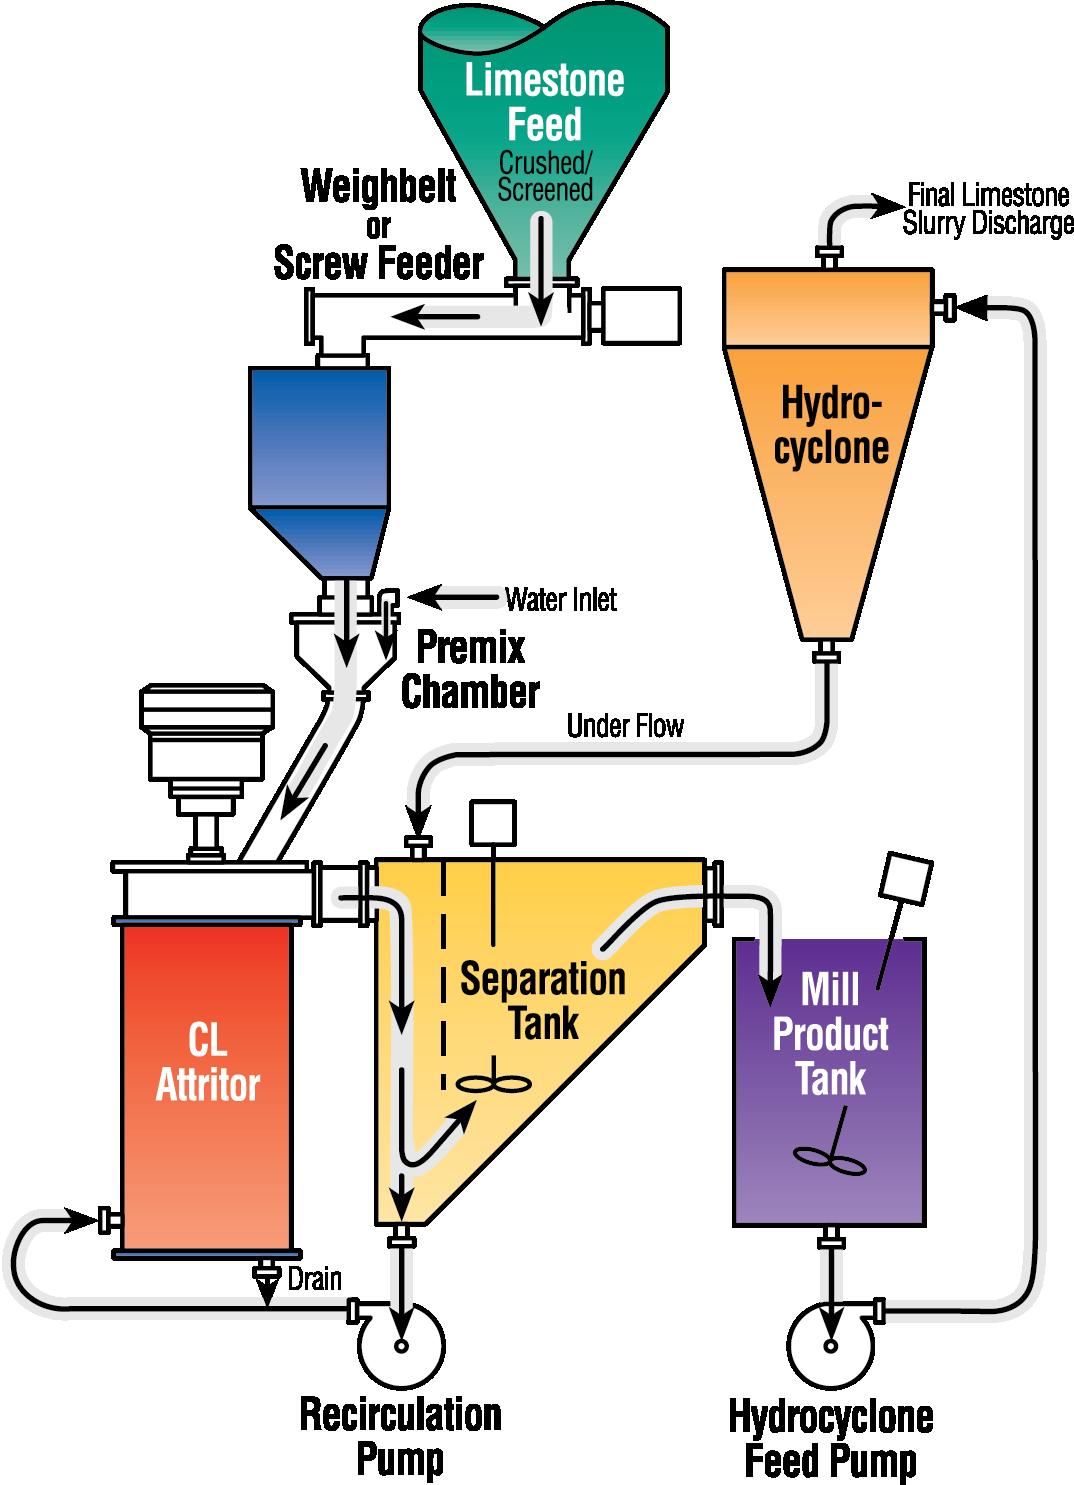 CL Attritor Grinding Process illustration